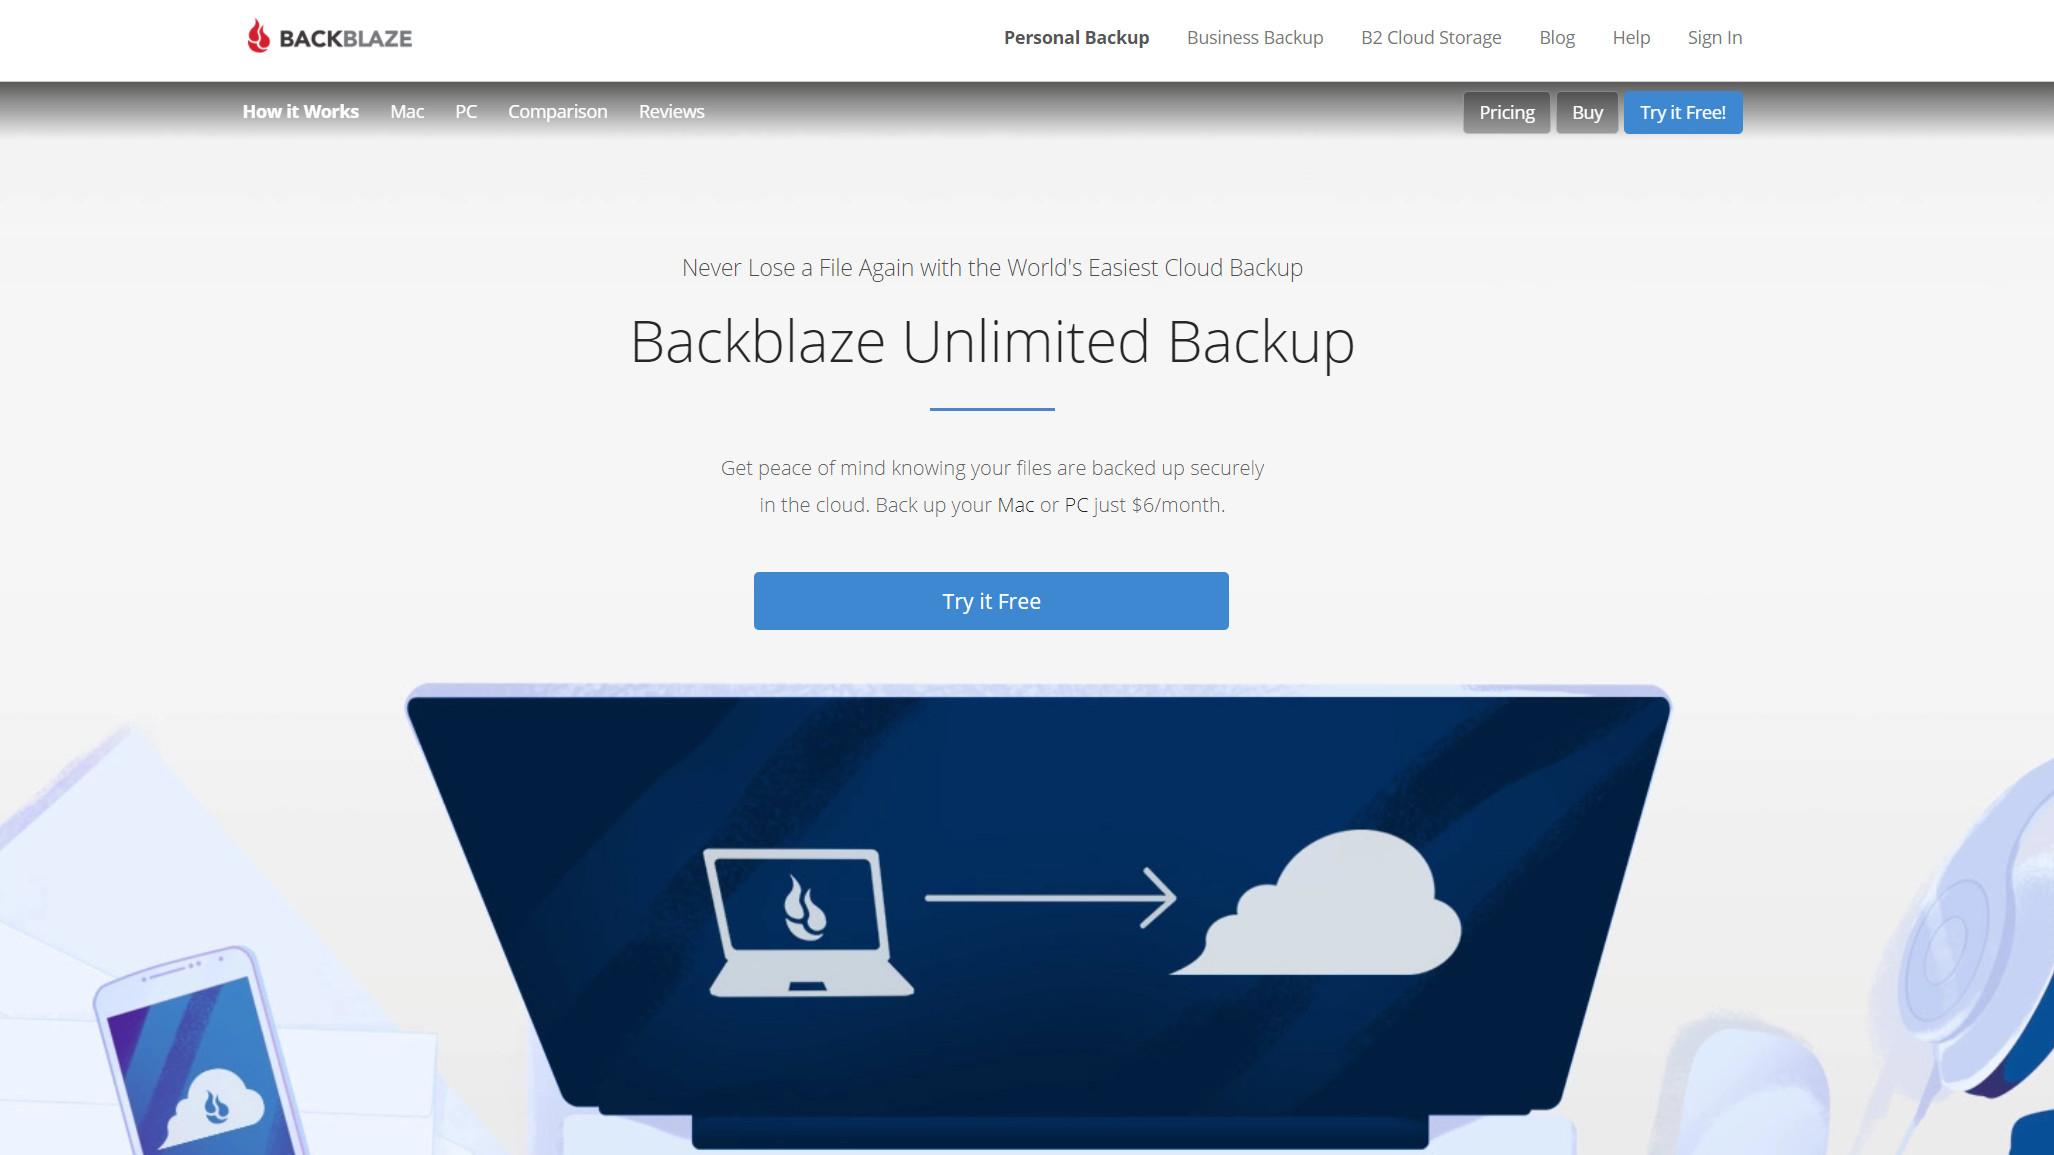 Backblaze website